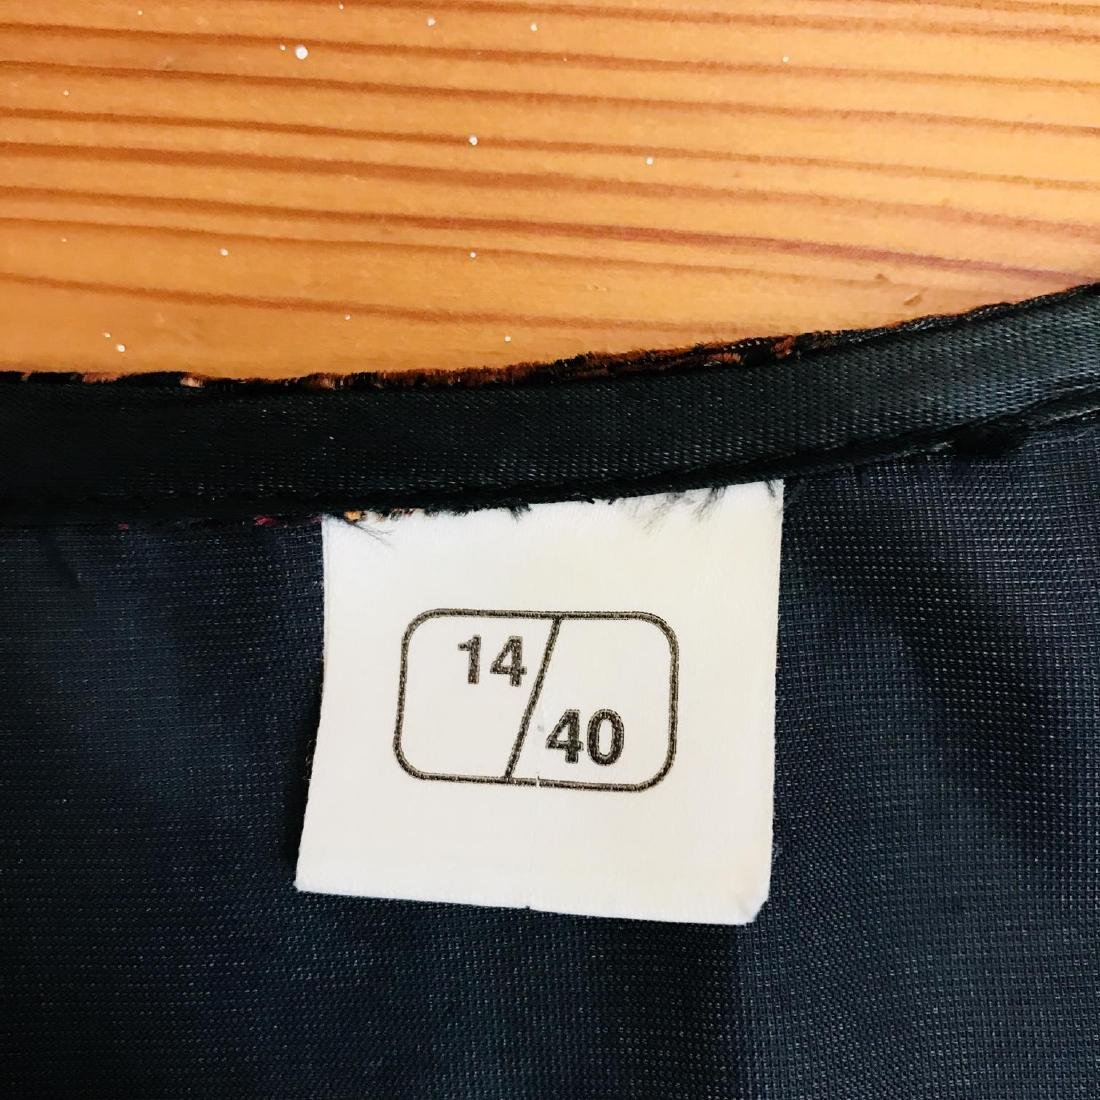 Vintage Women's Jacket Blazer Top Size US 10 EUR 40 - 6